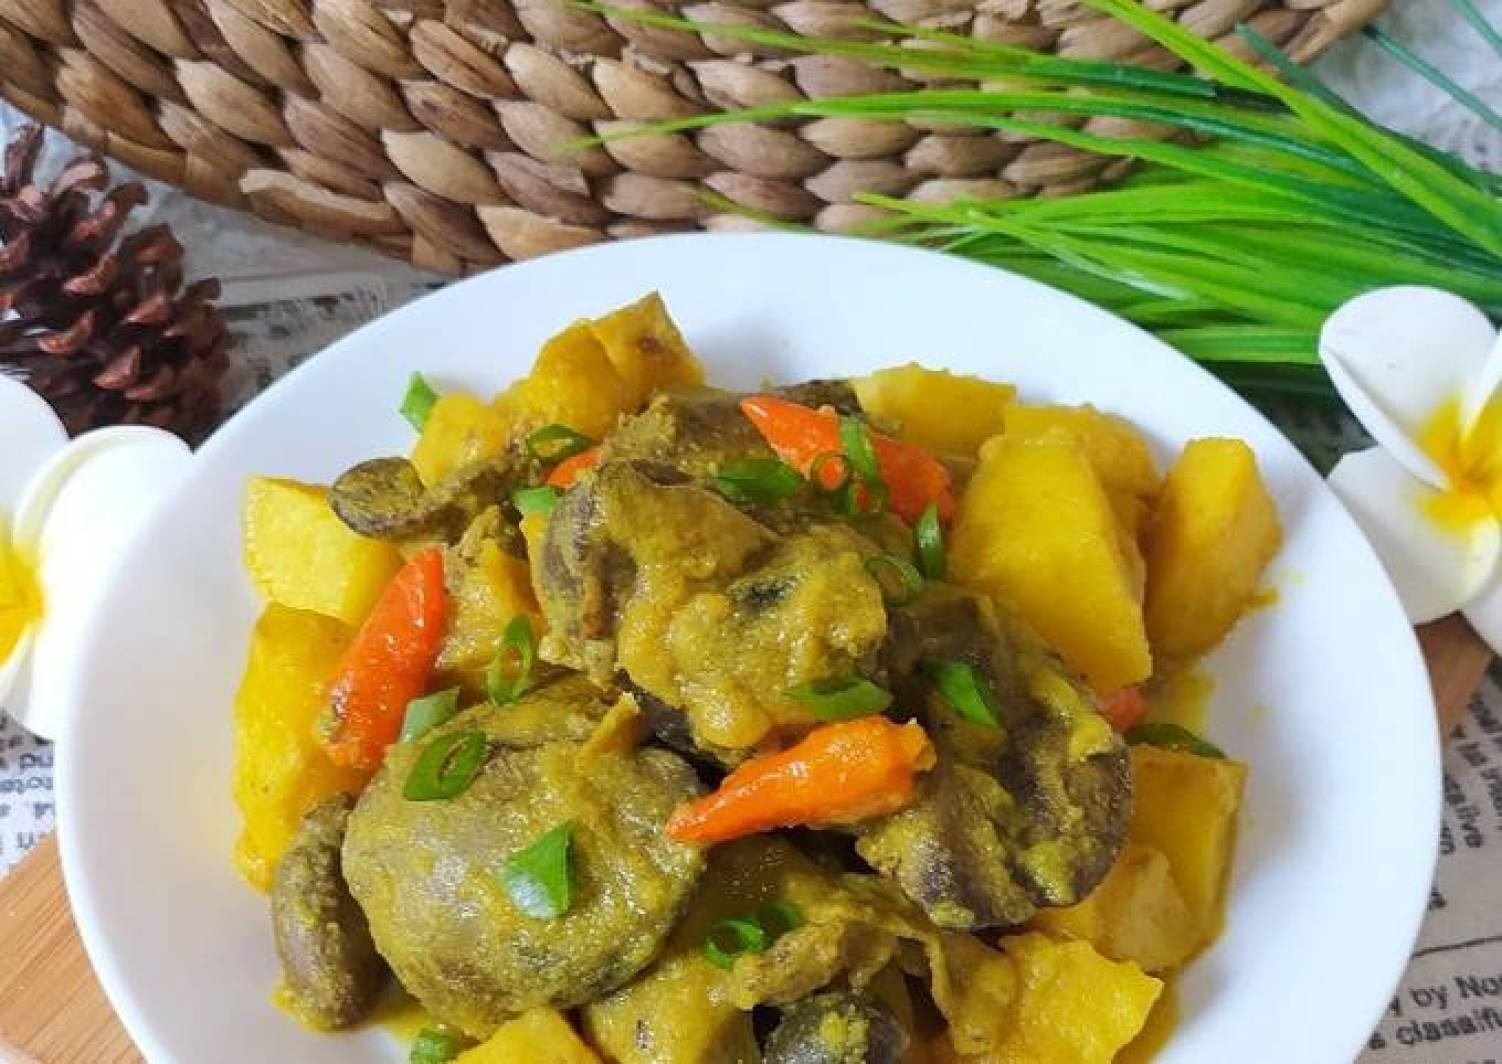 Resep Ati Ayam Bumbu Kuning